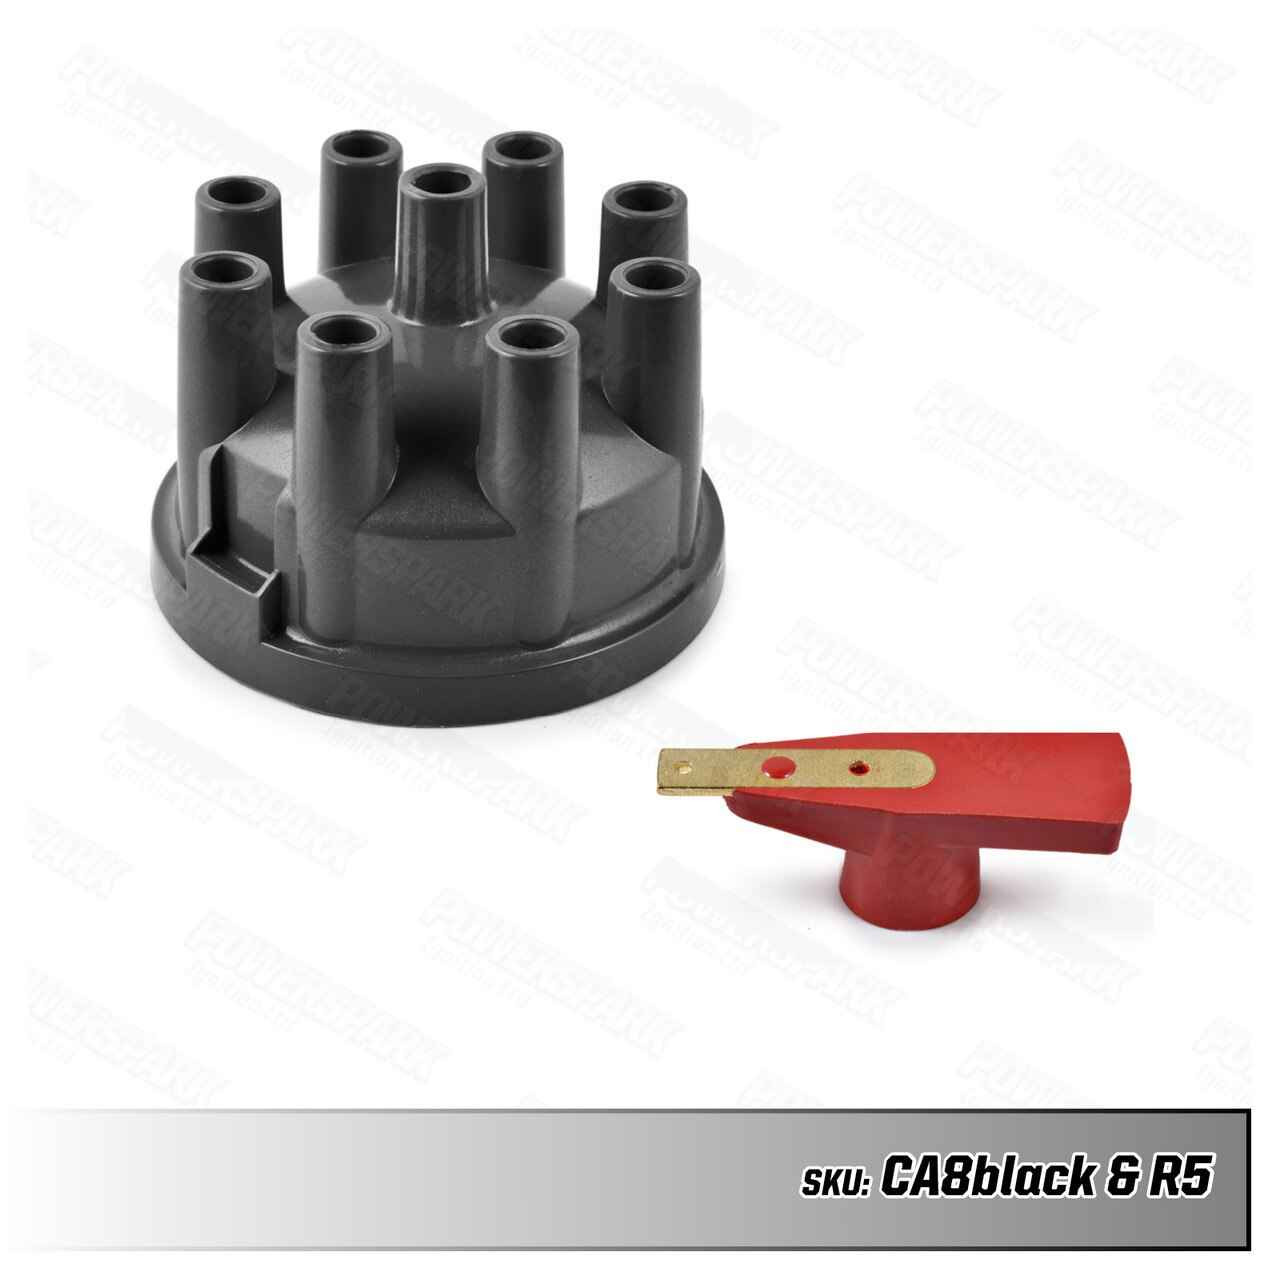 Lucas Lucas 35D V8 Distributor Cap and Rotor Arm Upgrade Kit